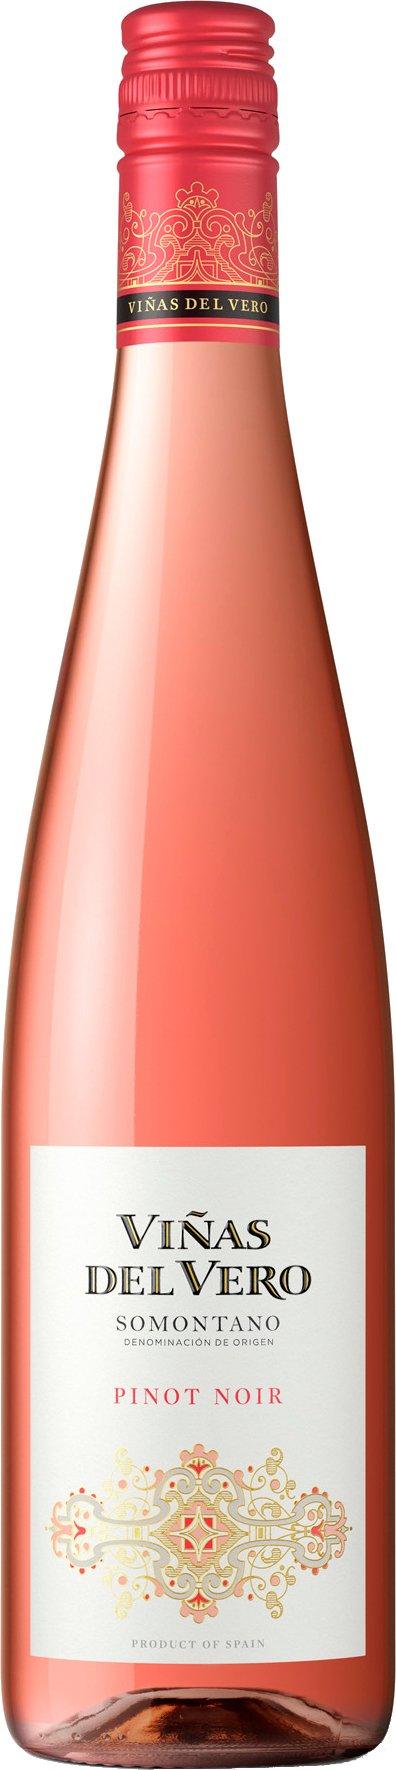 Viñas Del Vero Pinot Noir Rosado - Vino D.O. Somontano - Botella de 750 ml